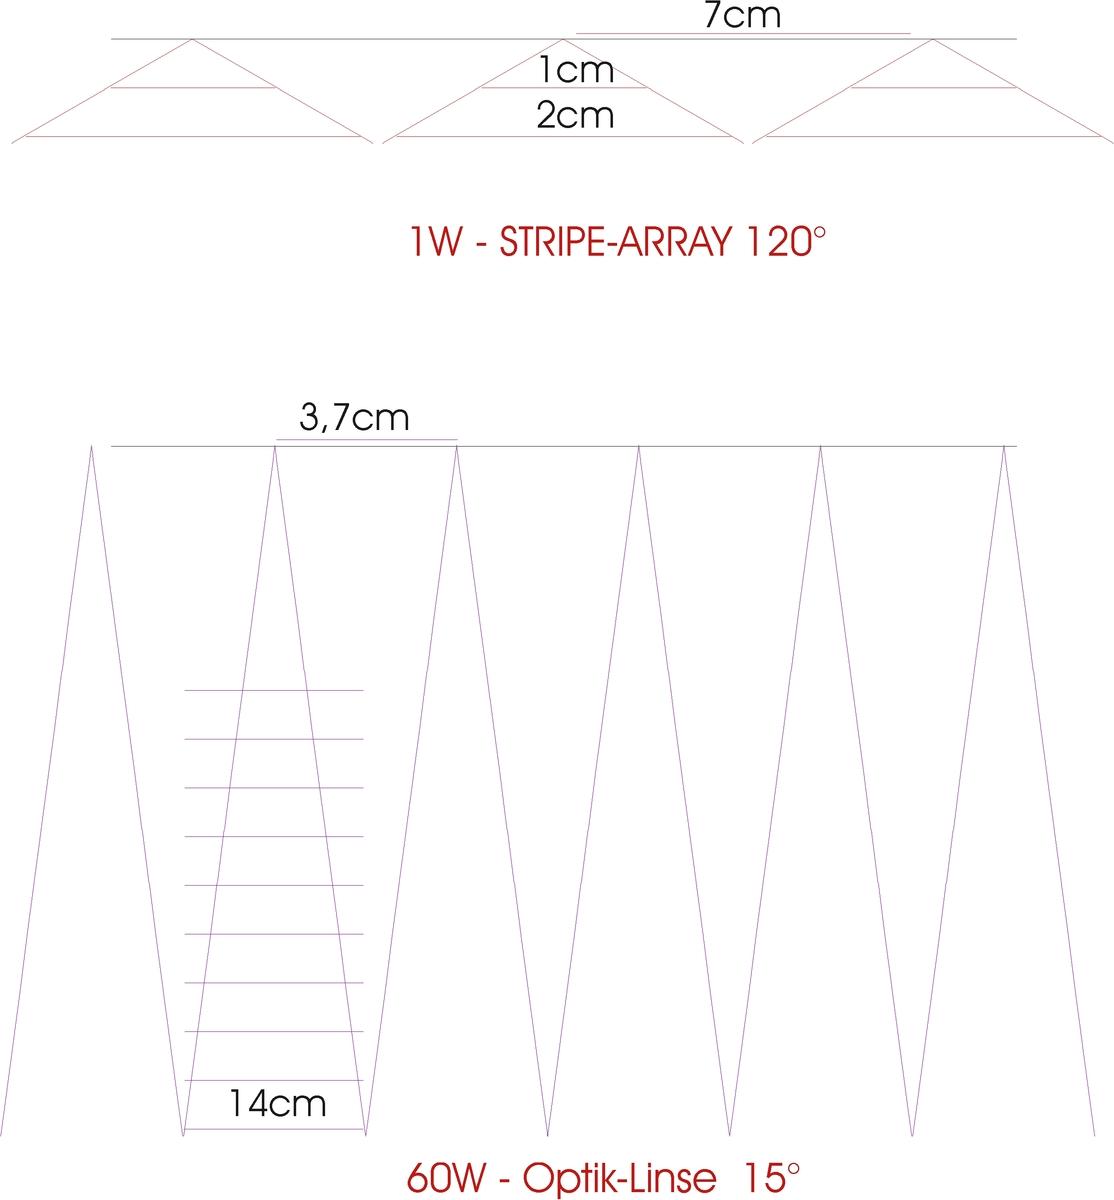 effiziente led beleuchtung modular wie am besten. Black Bedroom Furniture Sets. Home Design Ideas